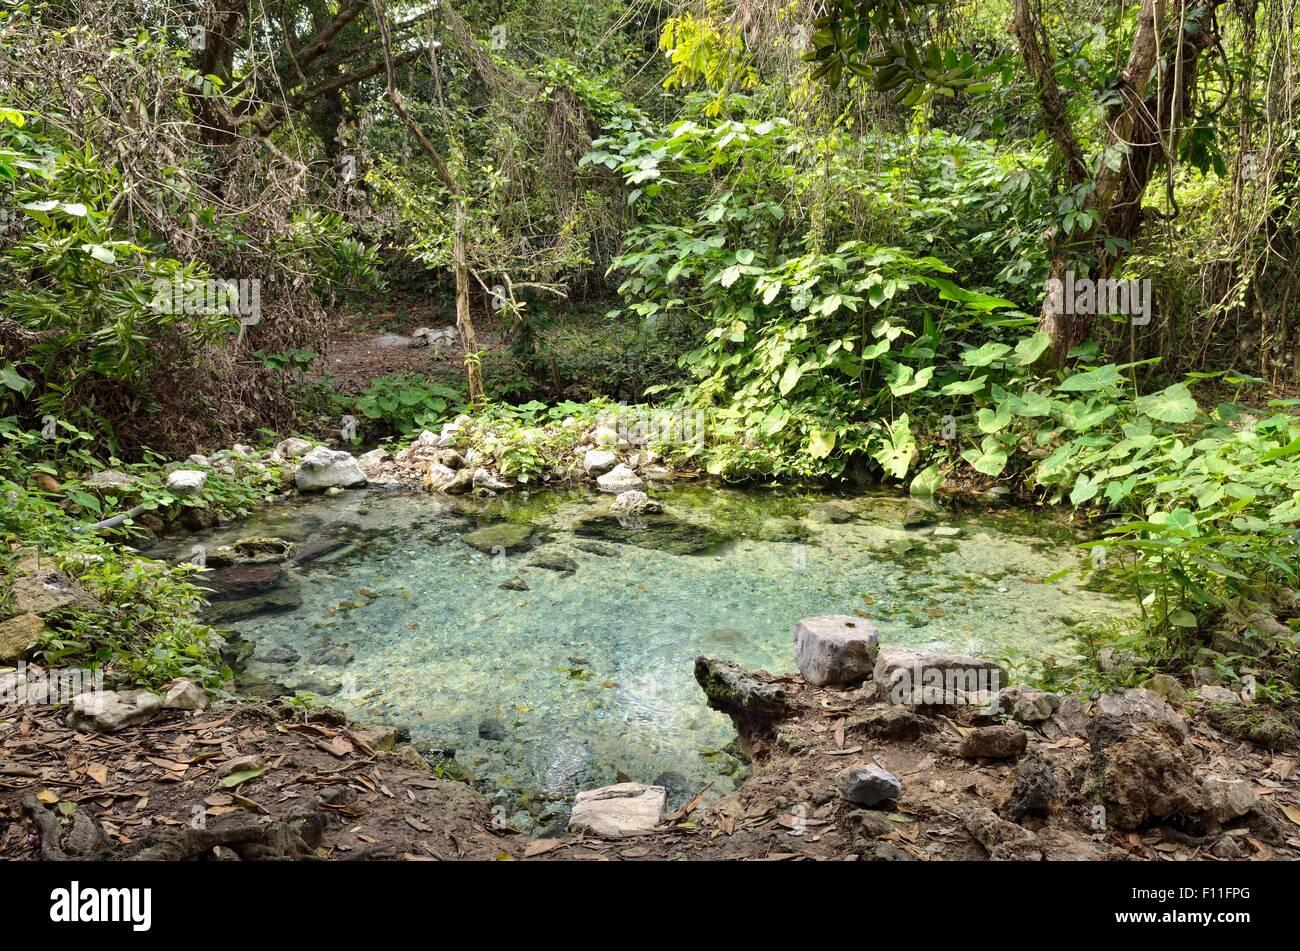 Spring with water, Arroyo de la Boza Azul, Apazapan, Veracruz, Mexico - Stock Image